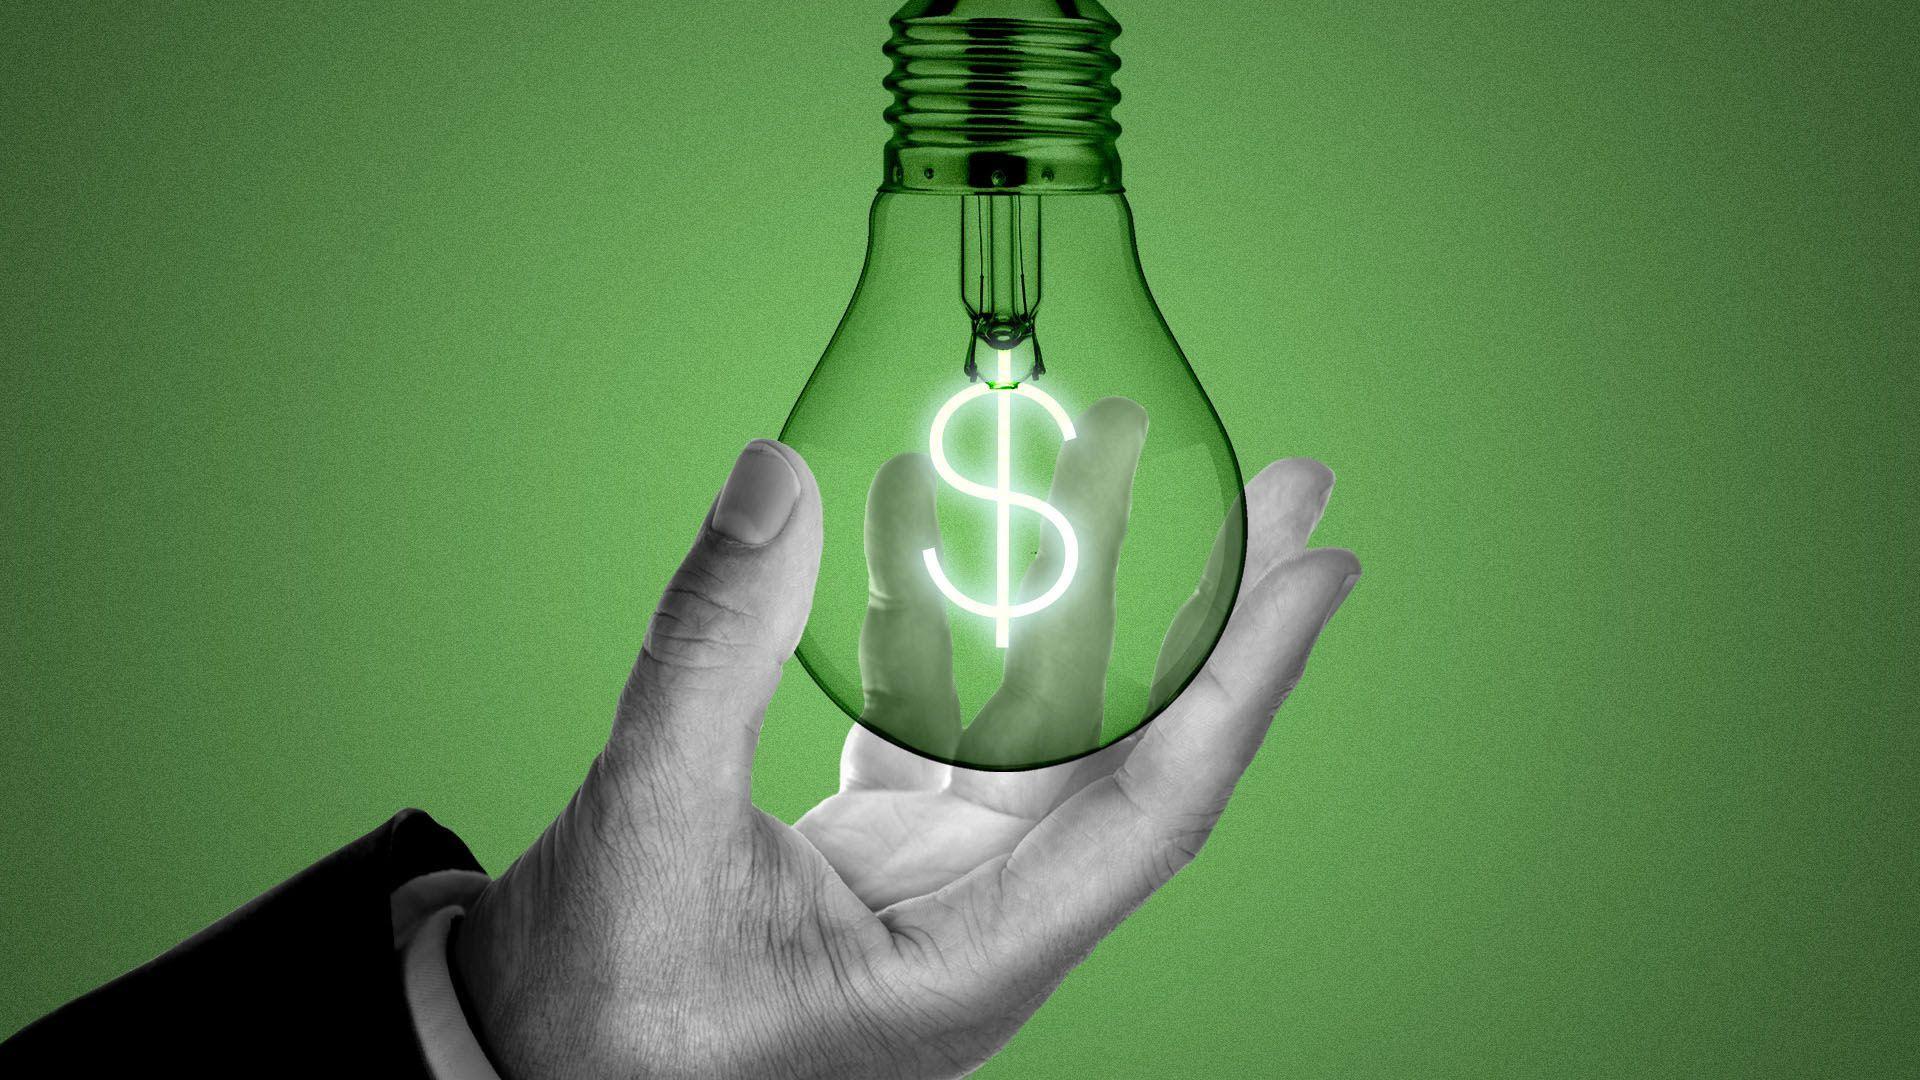 An illustration of a hand holding a lightbulb.